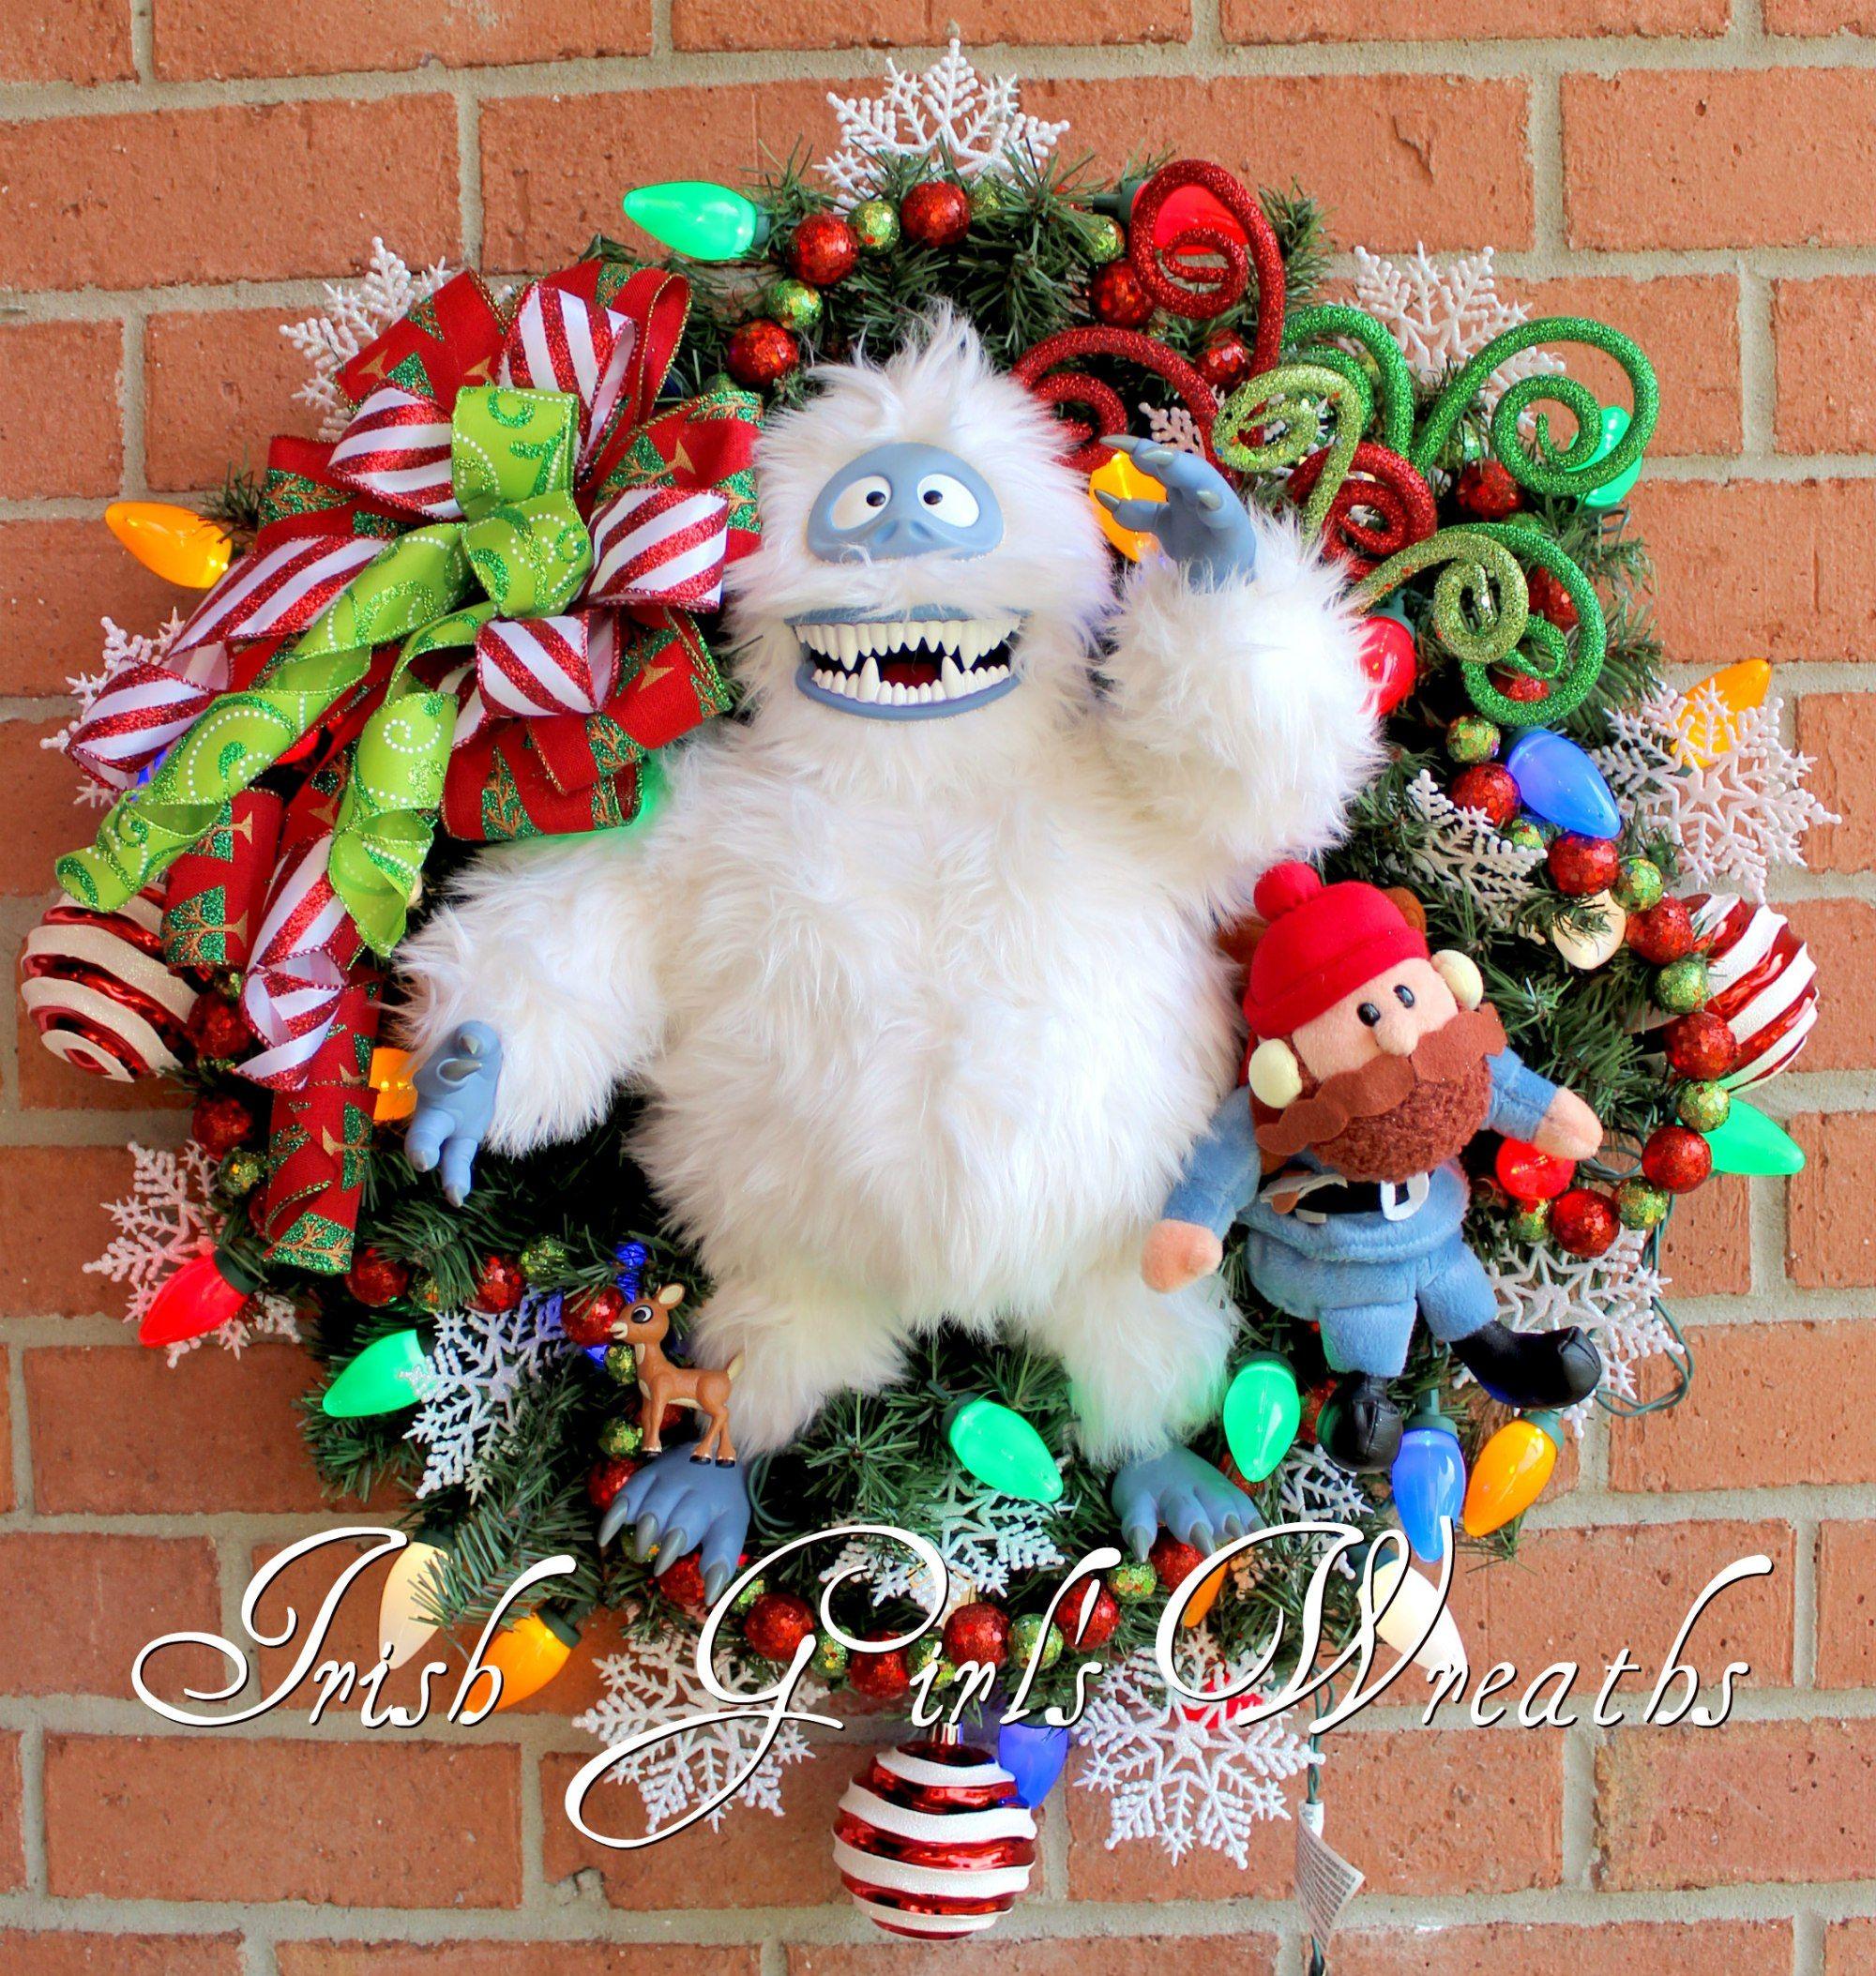 Bumble Snowmonster And Yukon Cornelius Christmas Wreath, Prelit, Rudolph Abominable